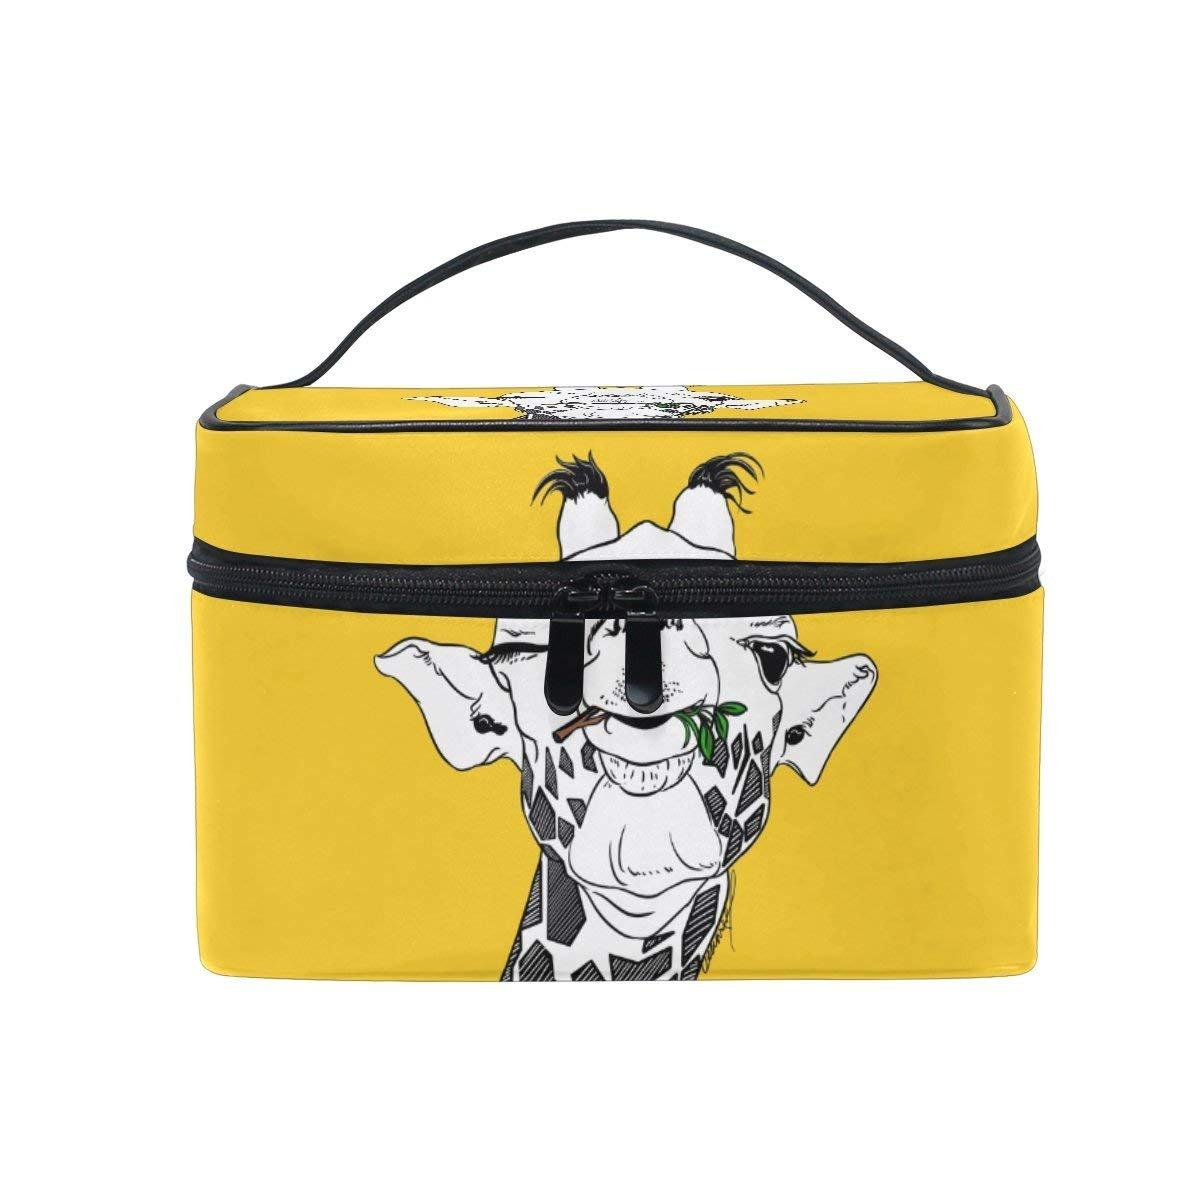 Beauty Makeup Train Case Cute Yellow Eating Giraffe Wink Korean Carrying Portable Zip Travel Cosmetic Brush Bag Organizer Large for Girls Women